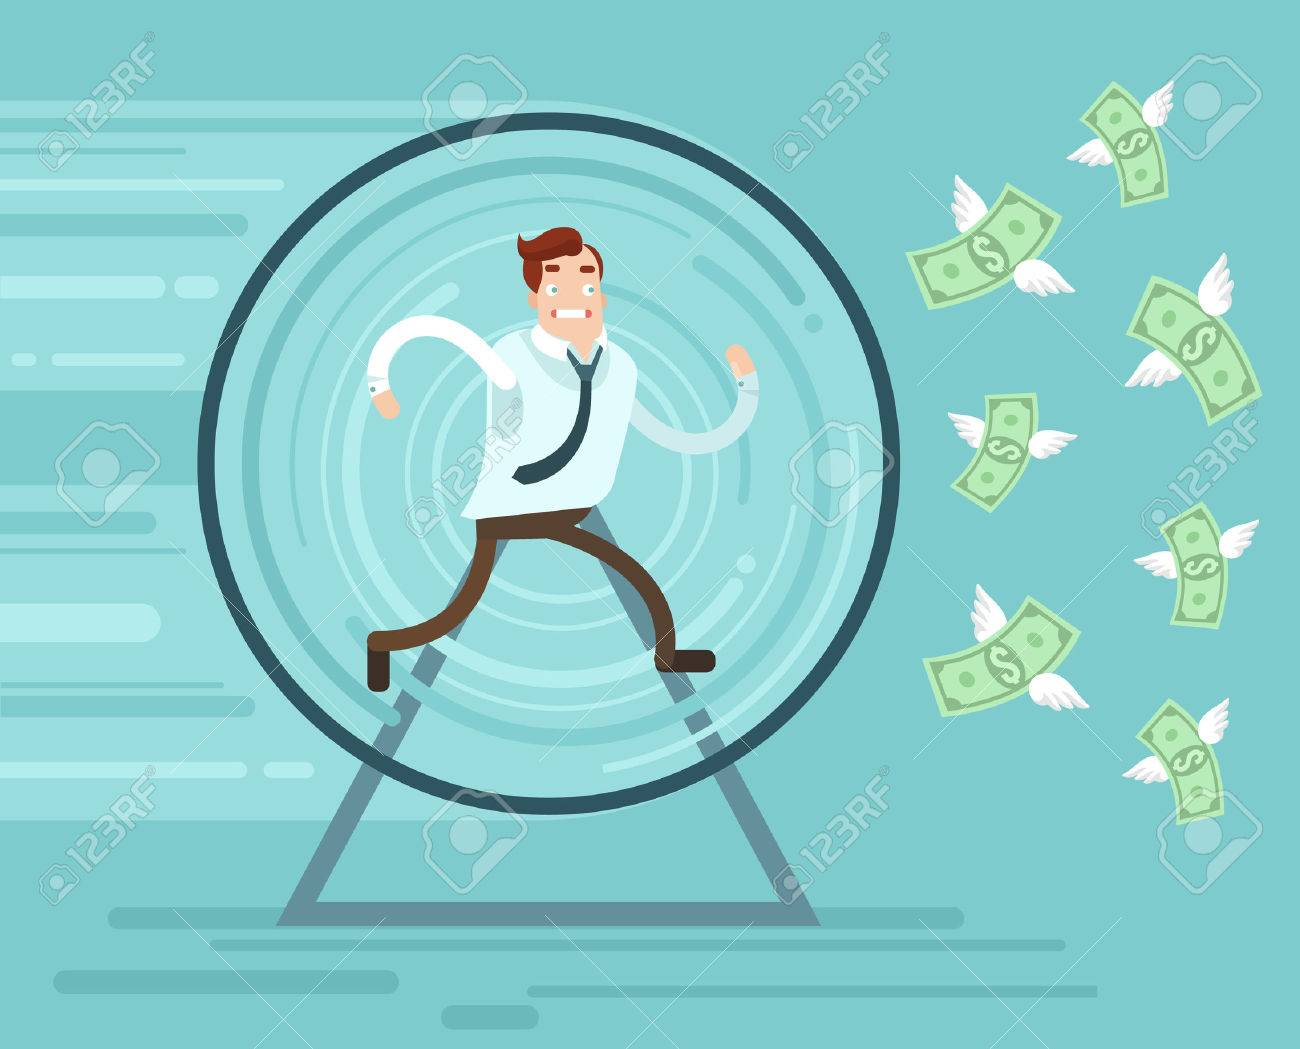 Businessman character runs trying catch money. Vector flat cartoon illustration - 63428246